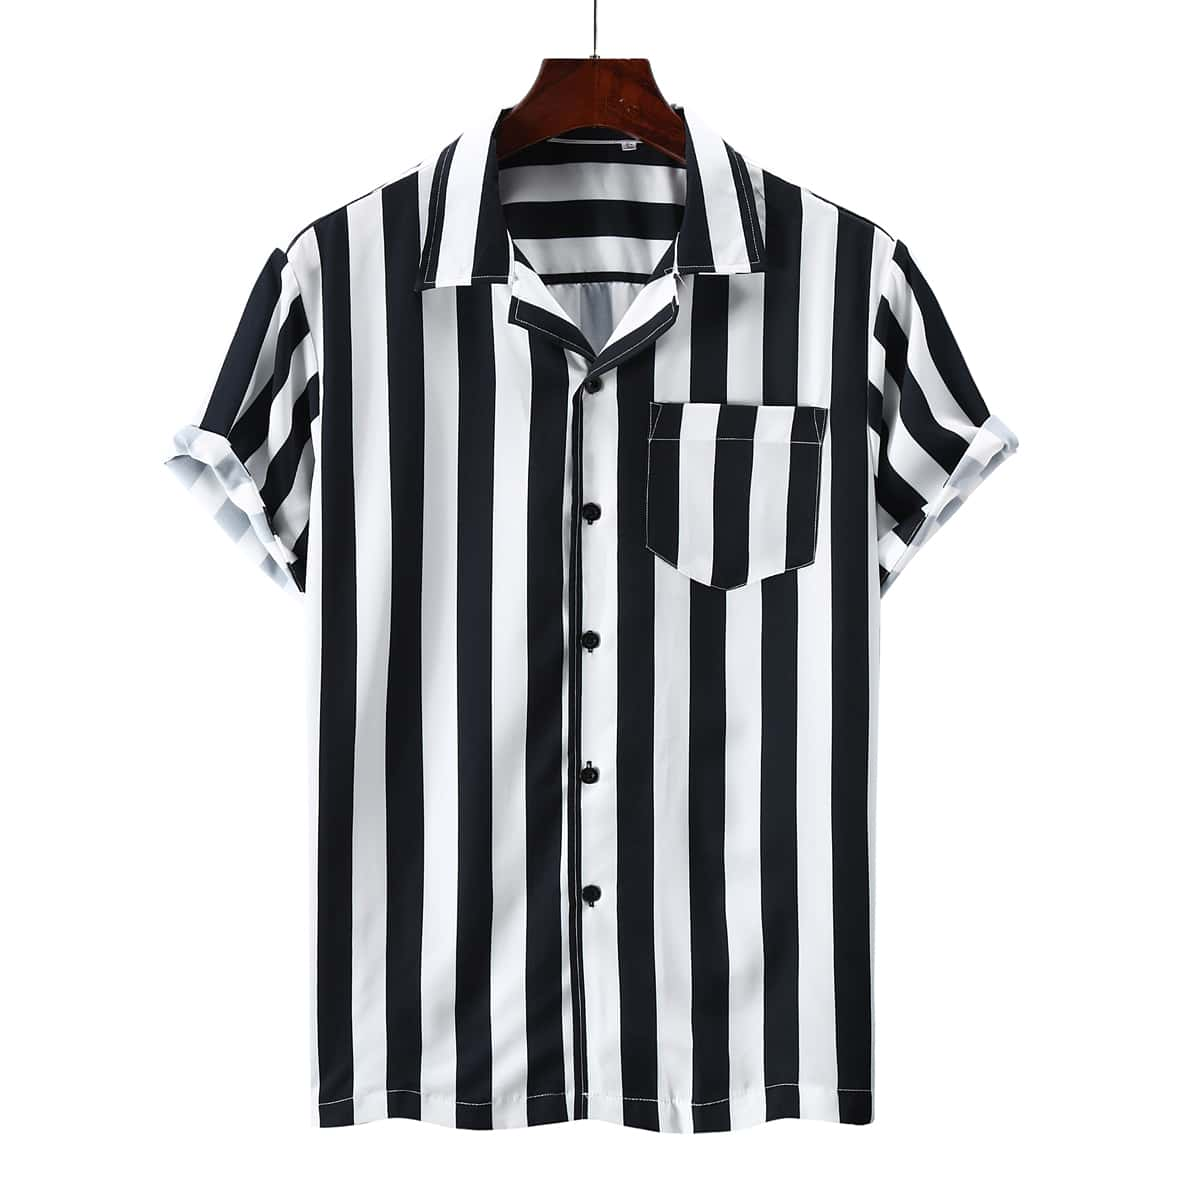 Мужская рубашка в полоску на пуговицах SheIn smshirt03210317986